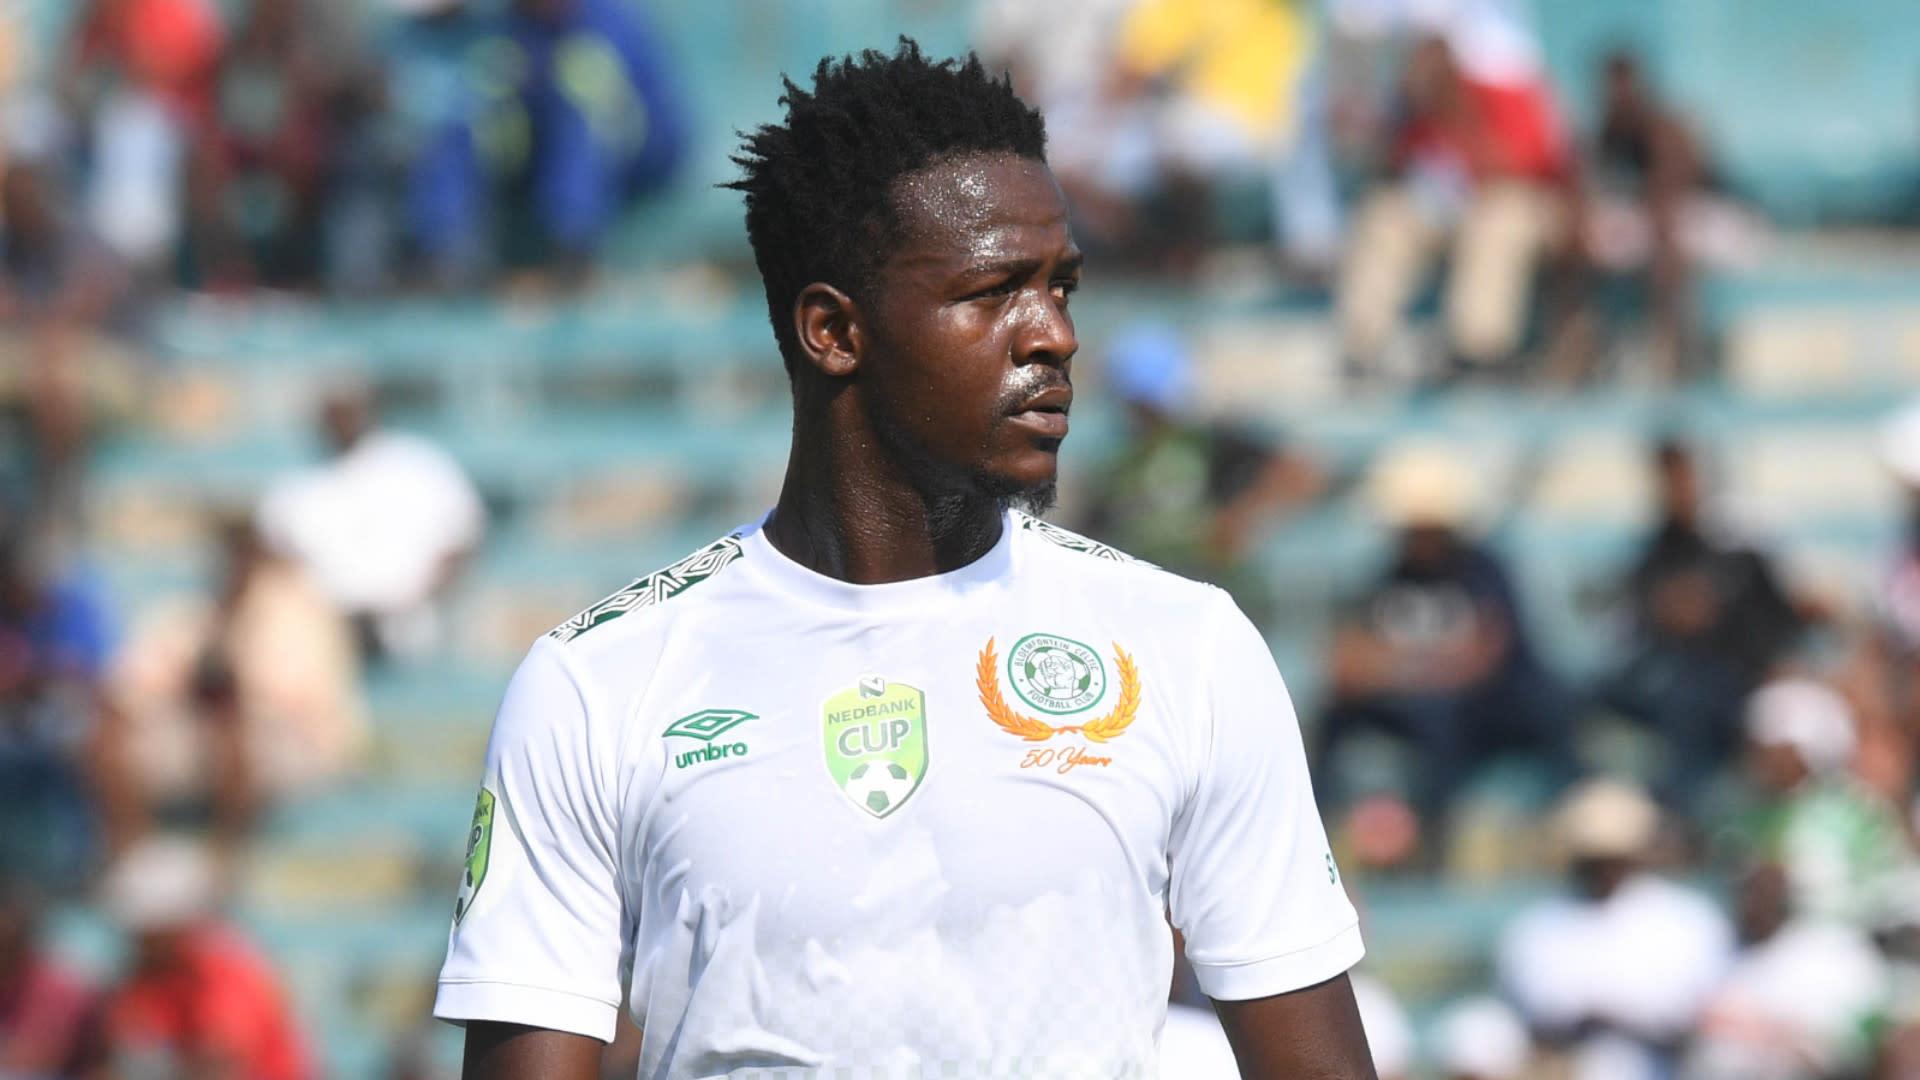 Chabalala: Orlando Pirates loan defender back to Bloemfontein Celtic